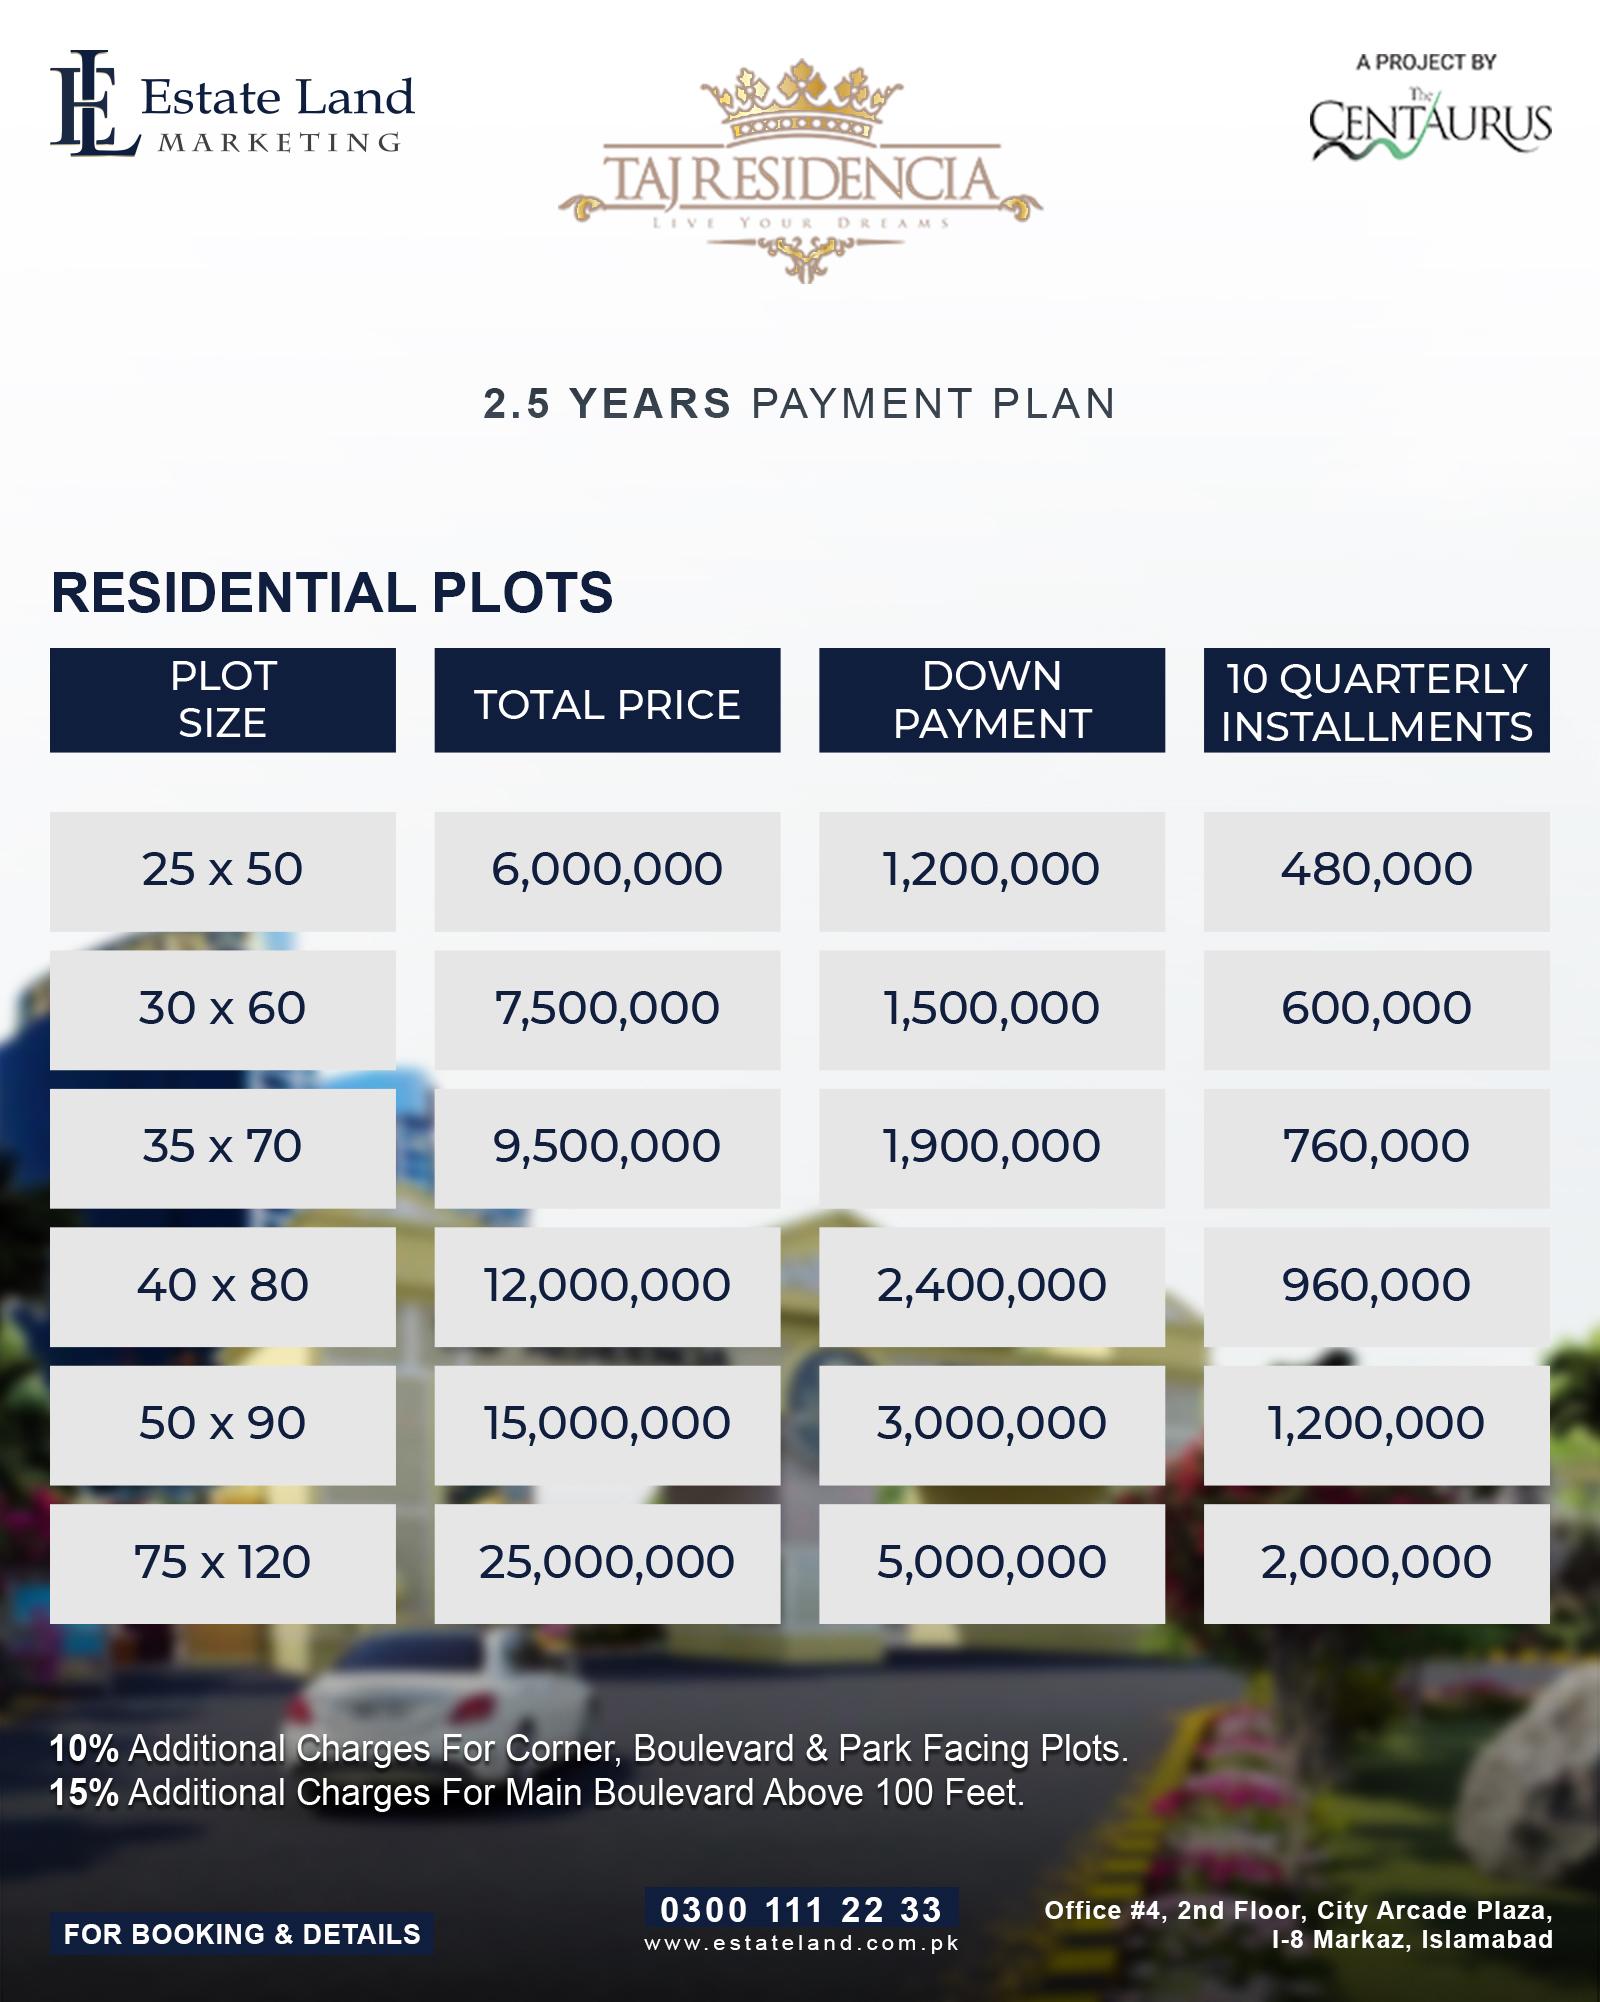 Taj residencia Housing Societies in Islamabad 2.5 year prices